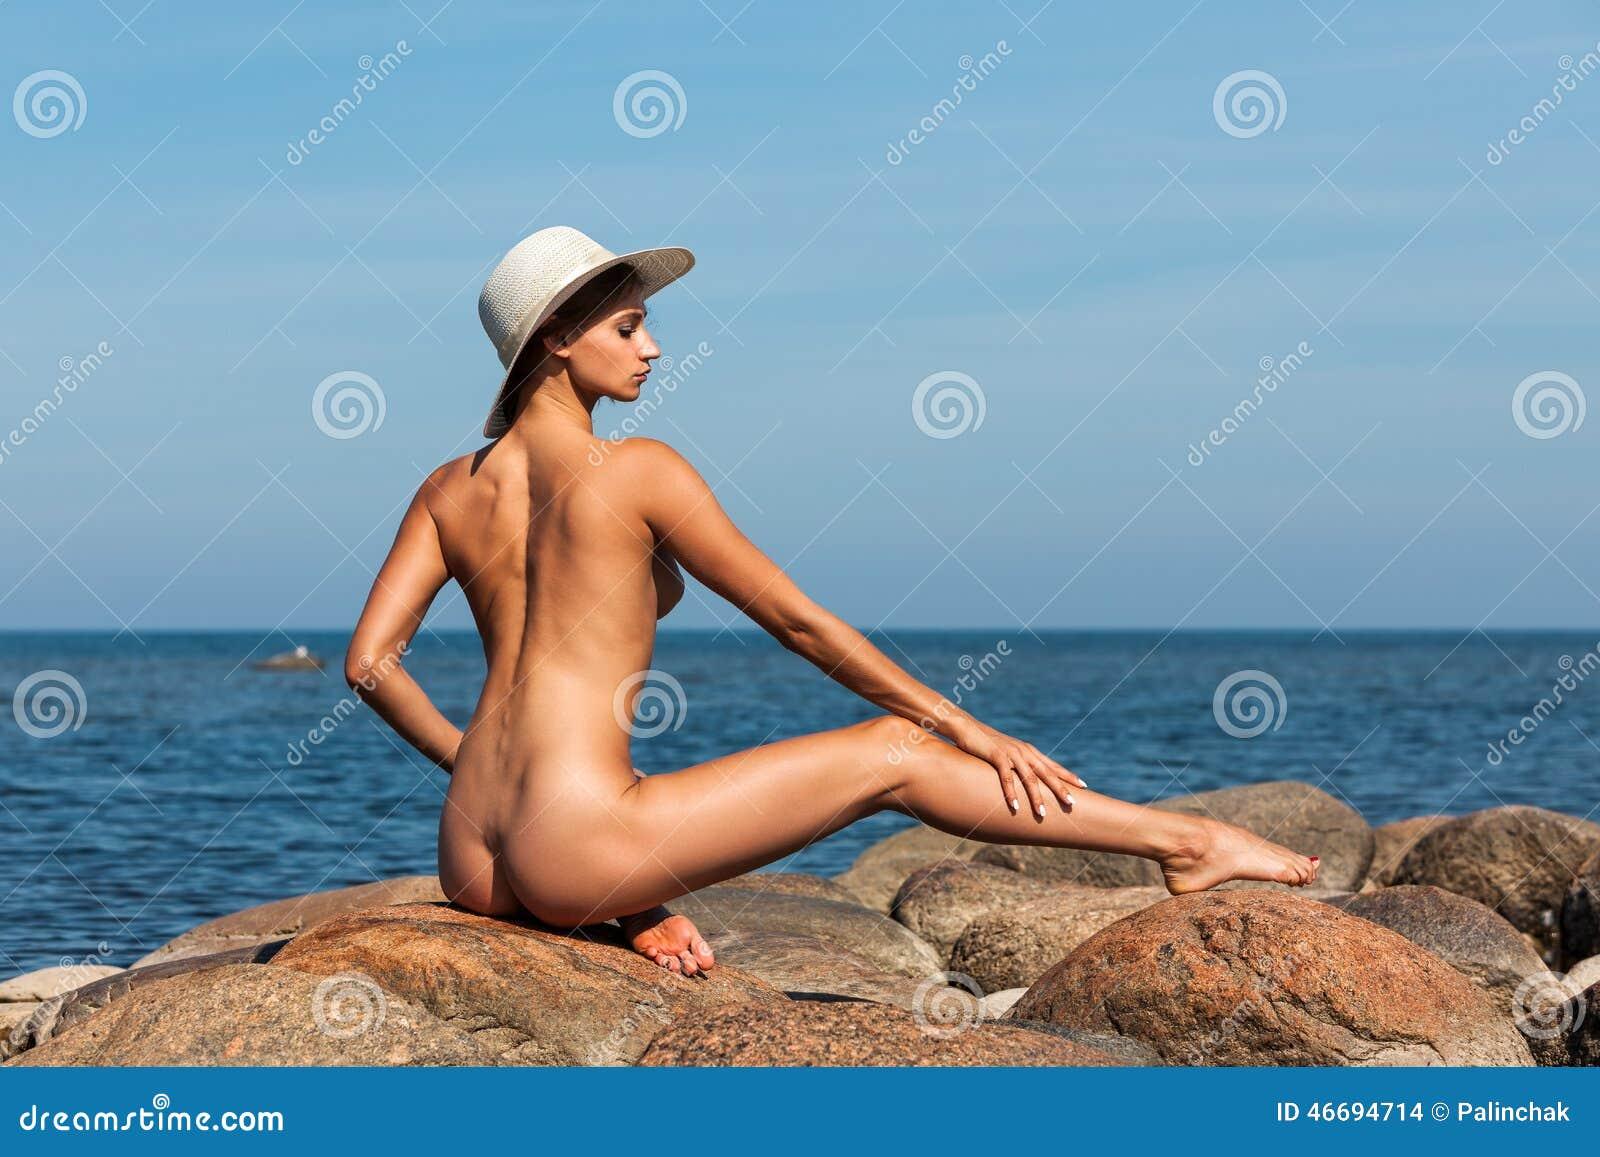 Sexy naked women on beach